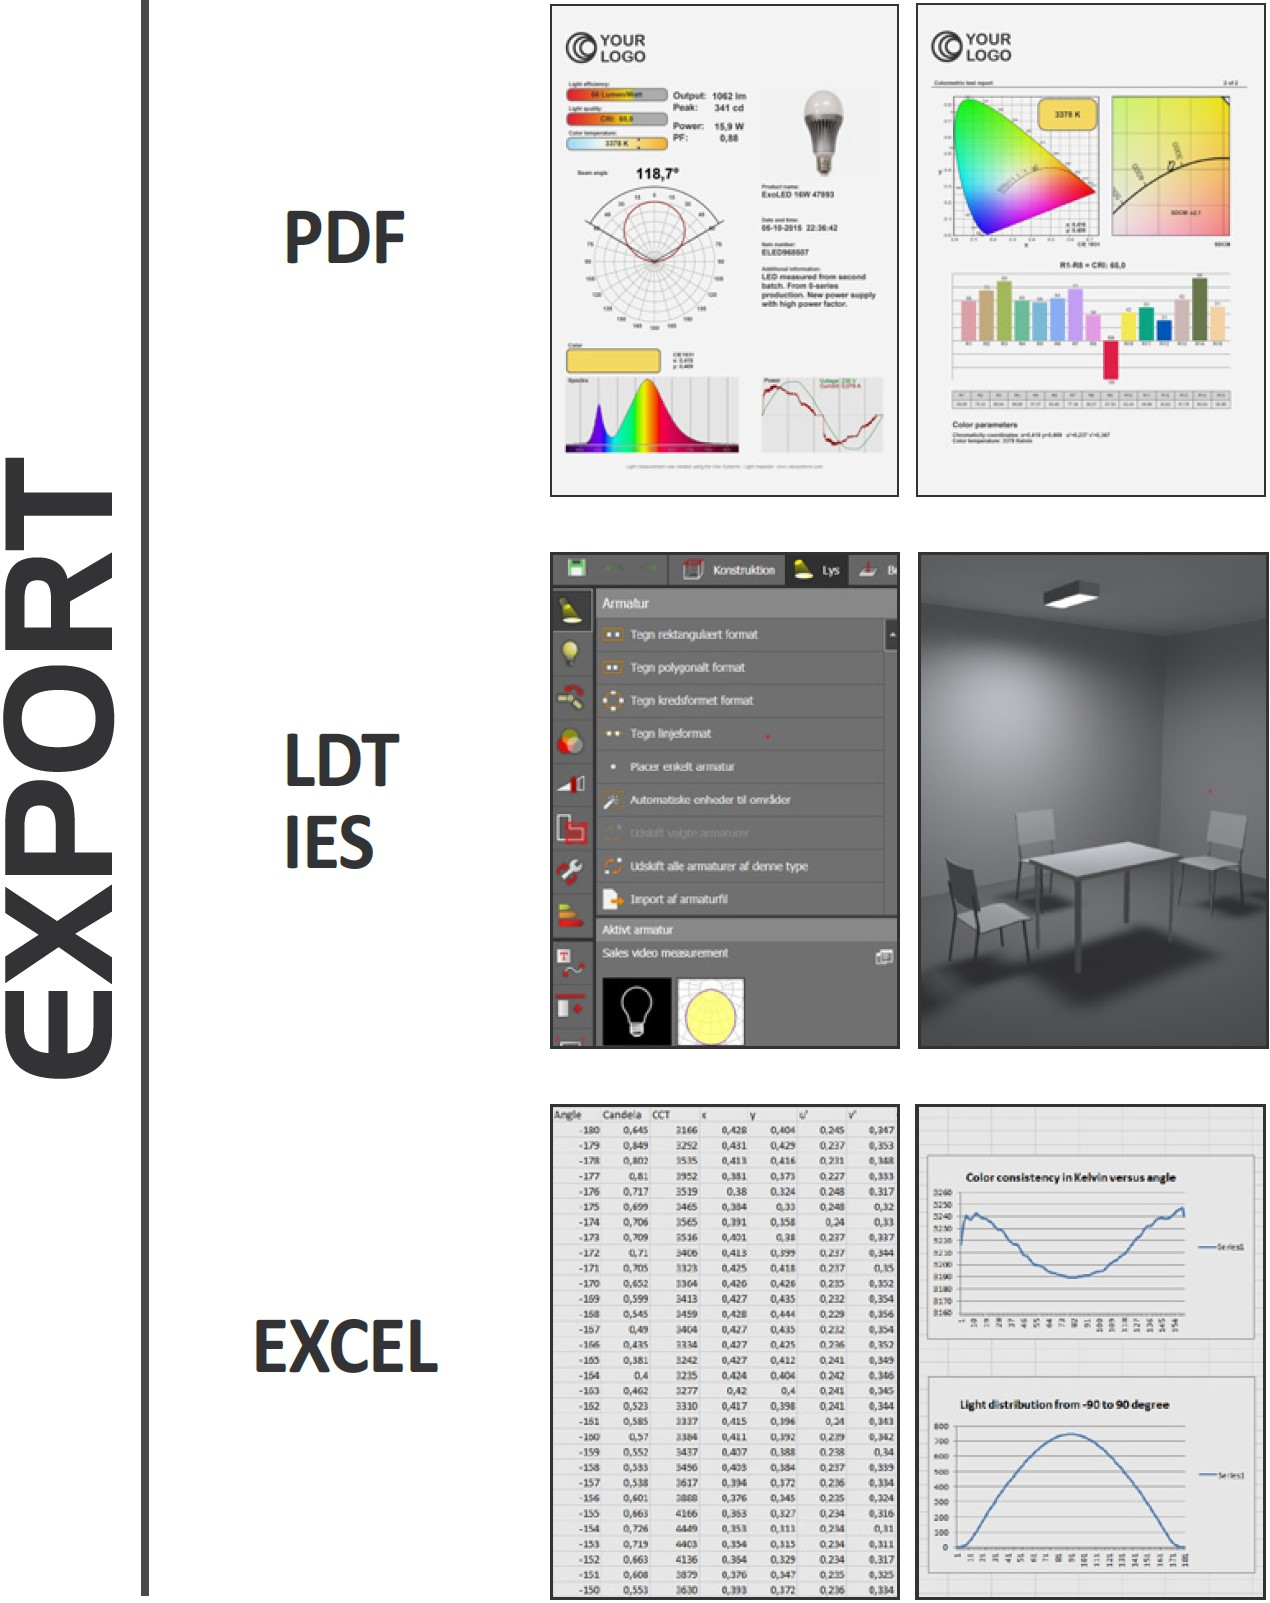 light measurement software output